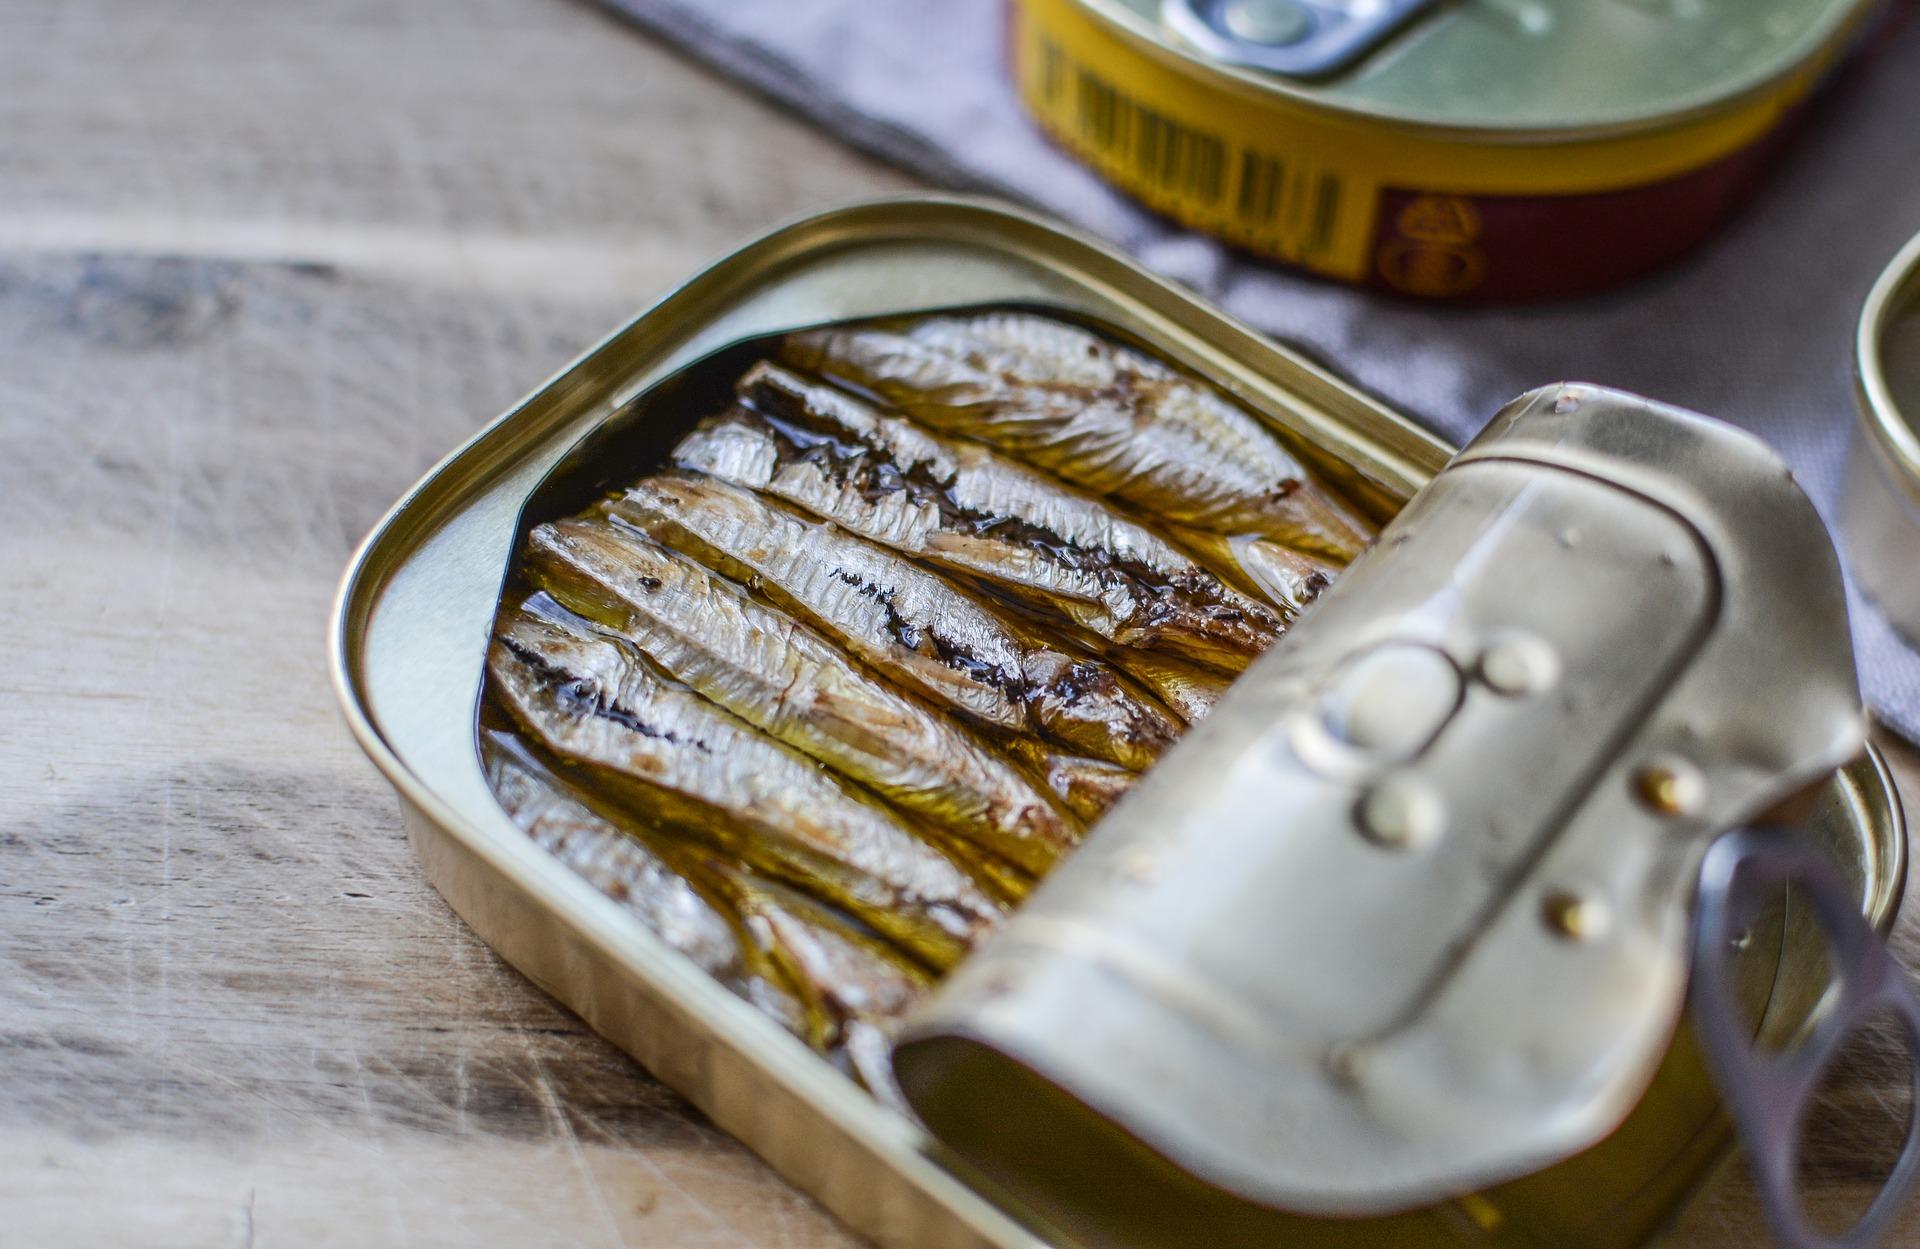 sardine boite conserve clcv